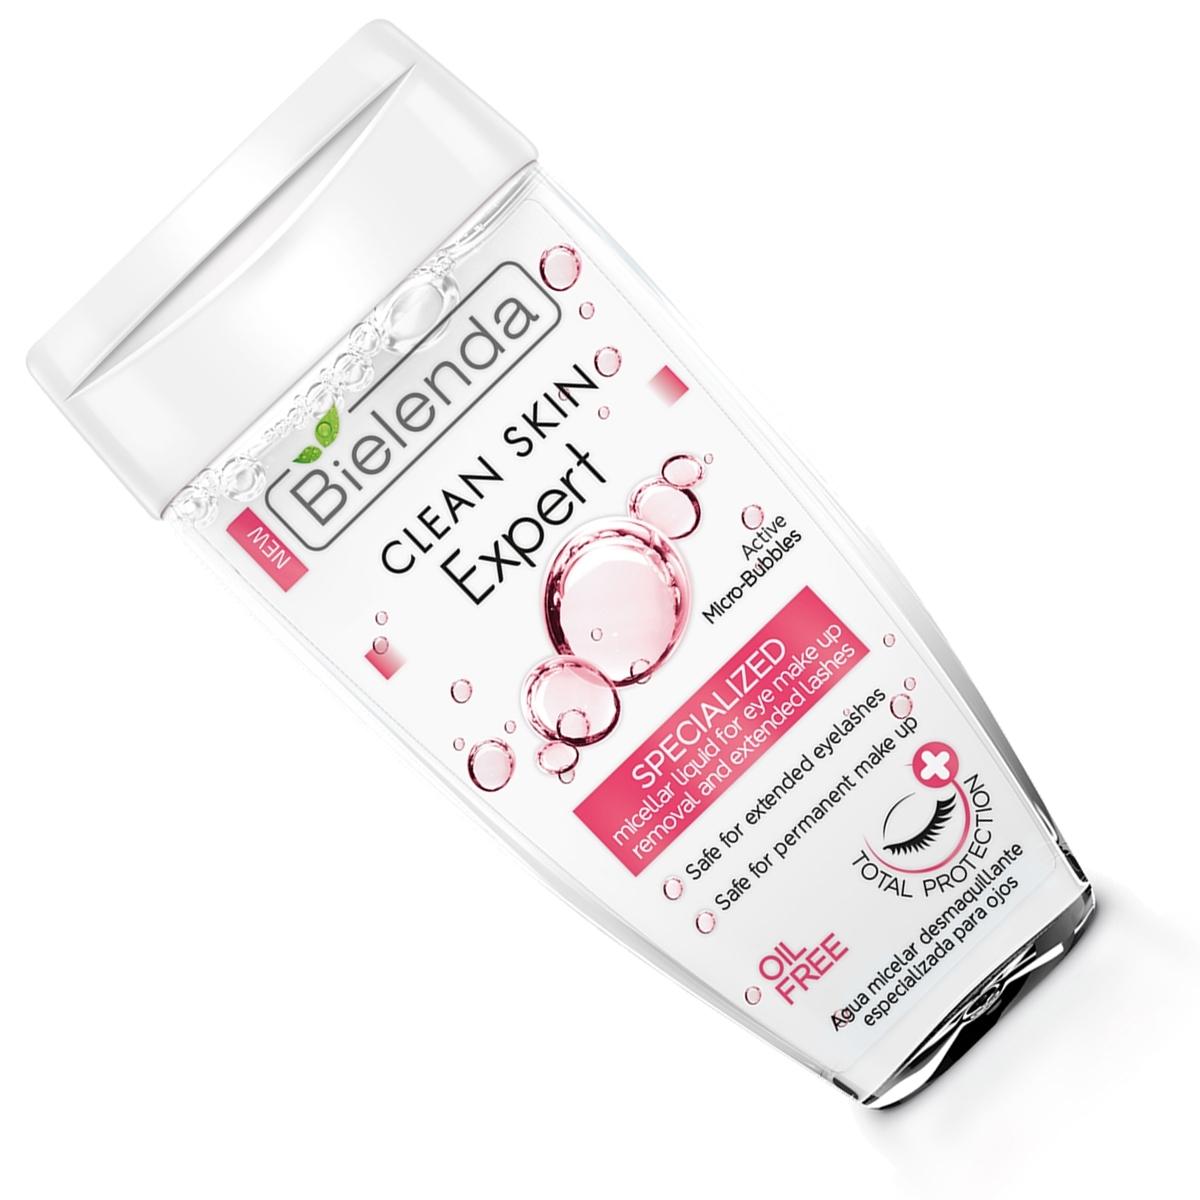 Bielenda Clean Skin Expert Eye Make-up Remover For Eyelash ...